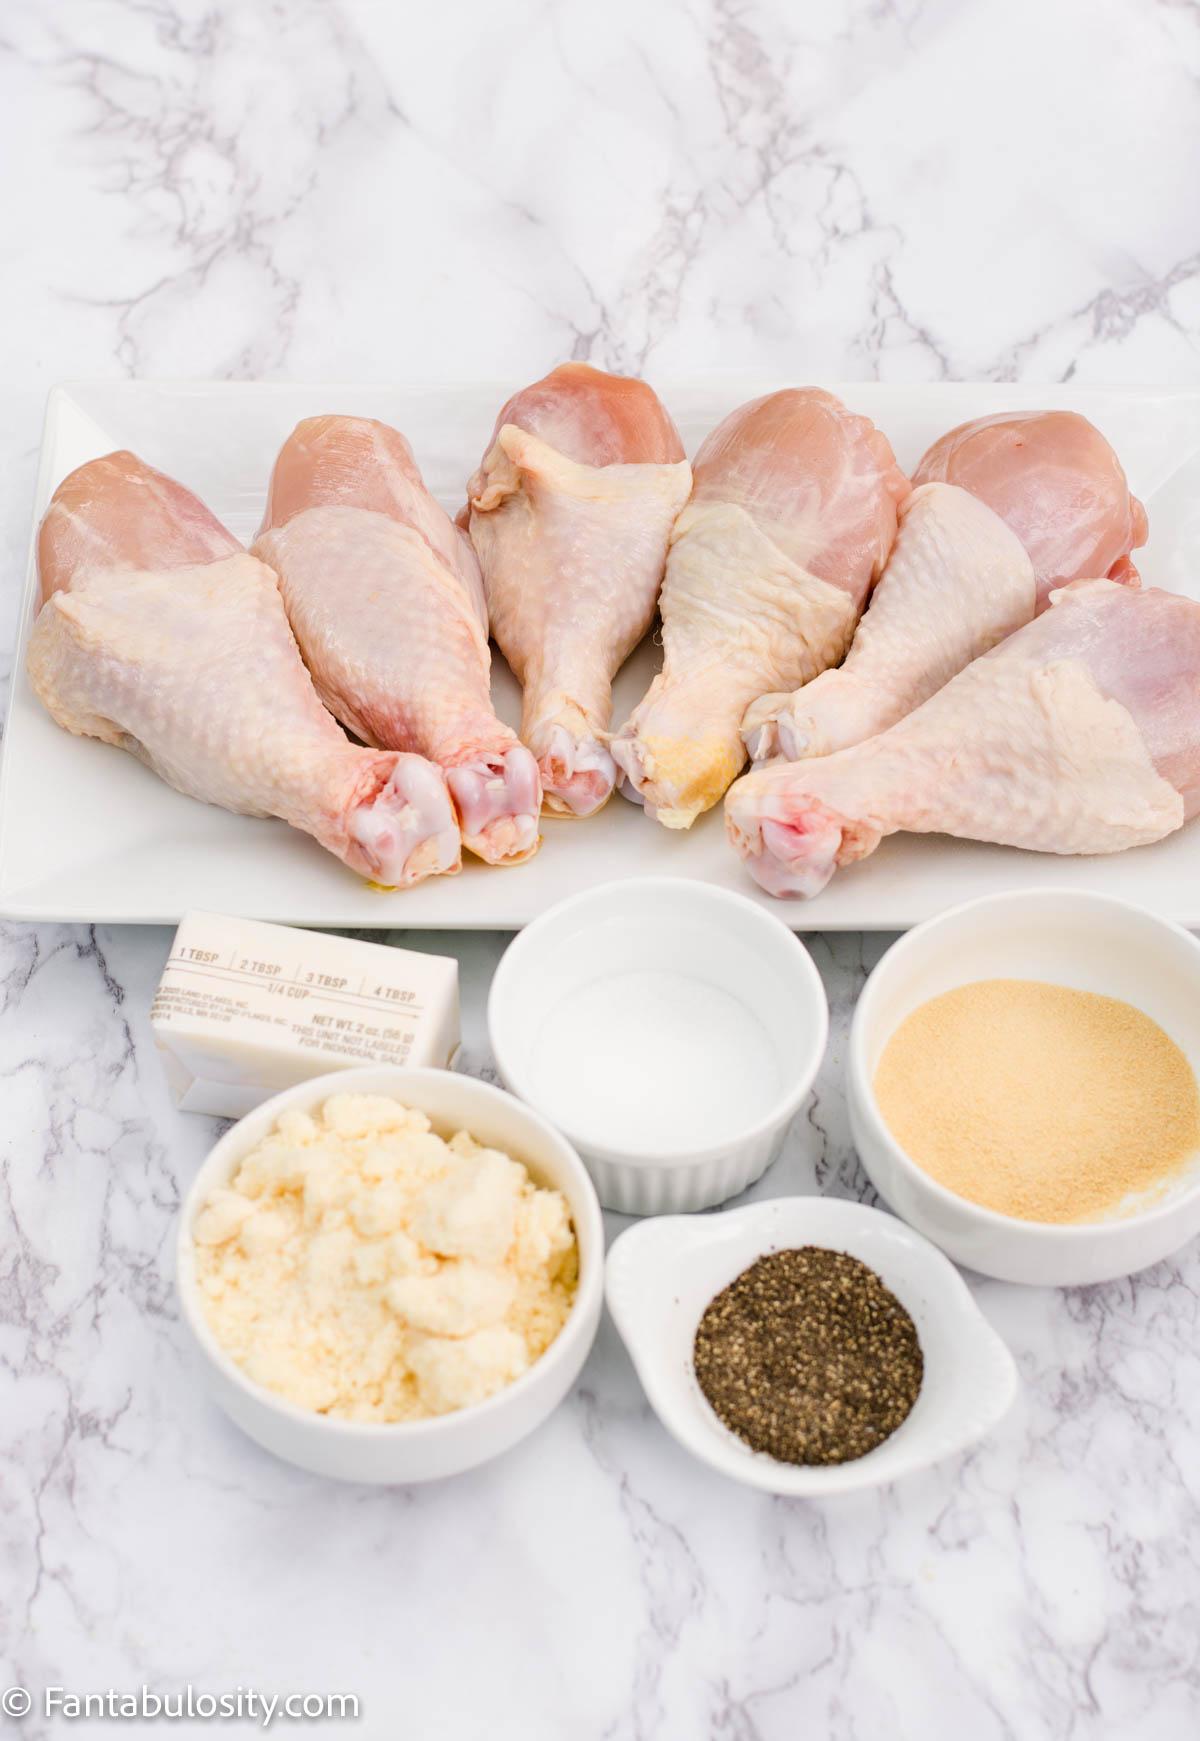 Ingredients for Chicken Drumsticks in Oven